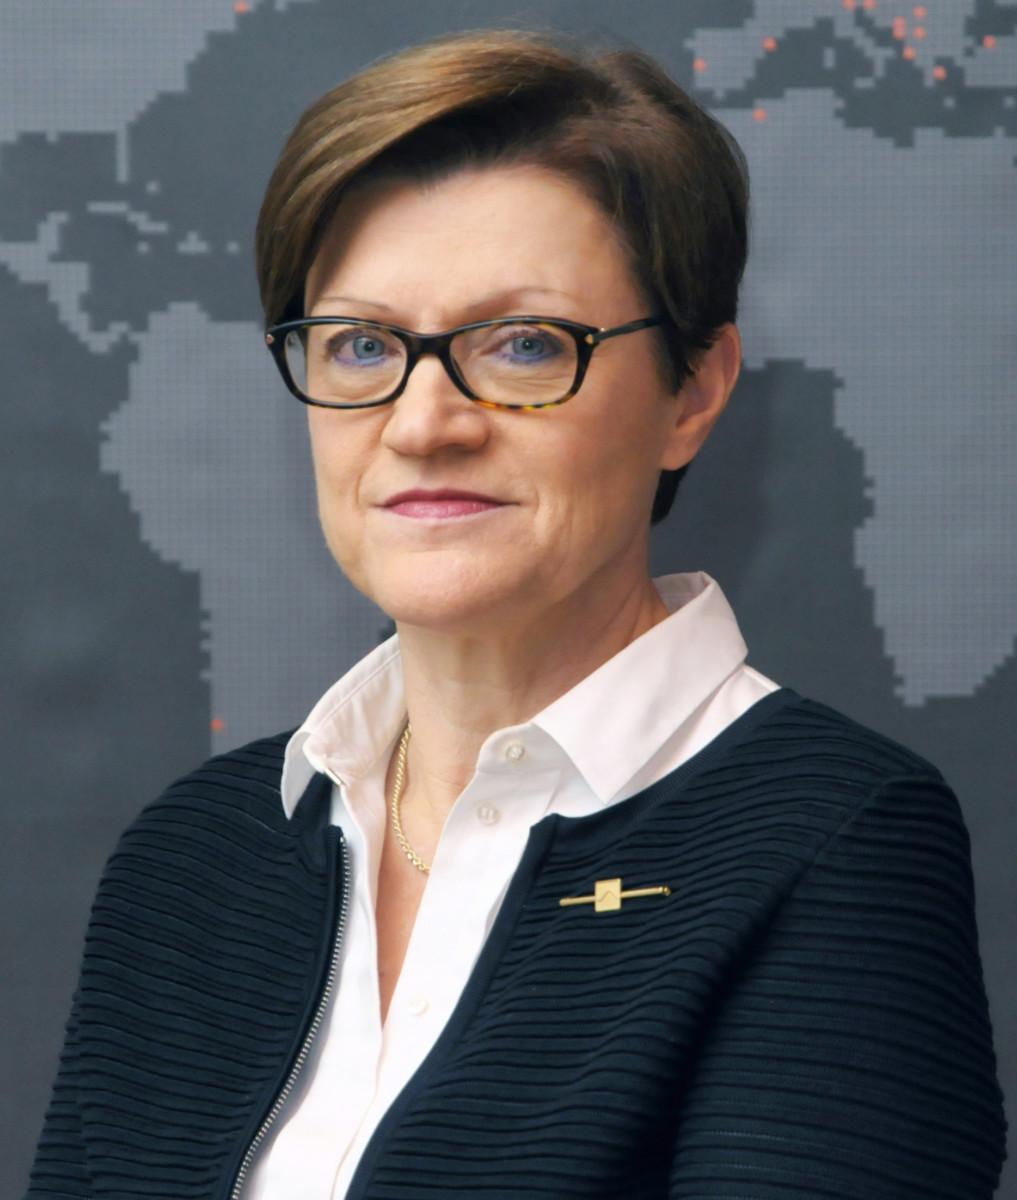 Barbara Ahlers prezes Roto Frank Okucia Budowlane